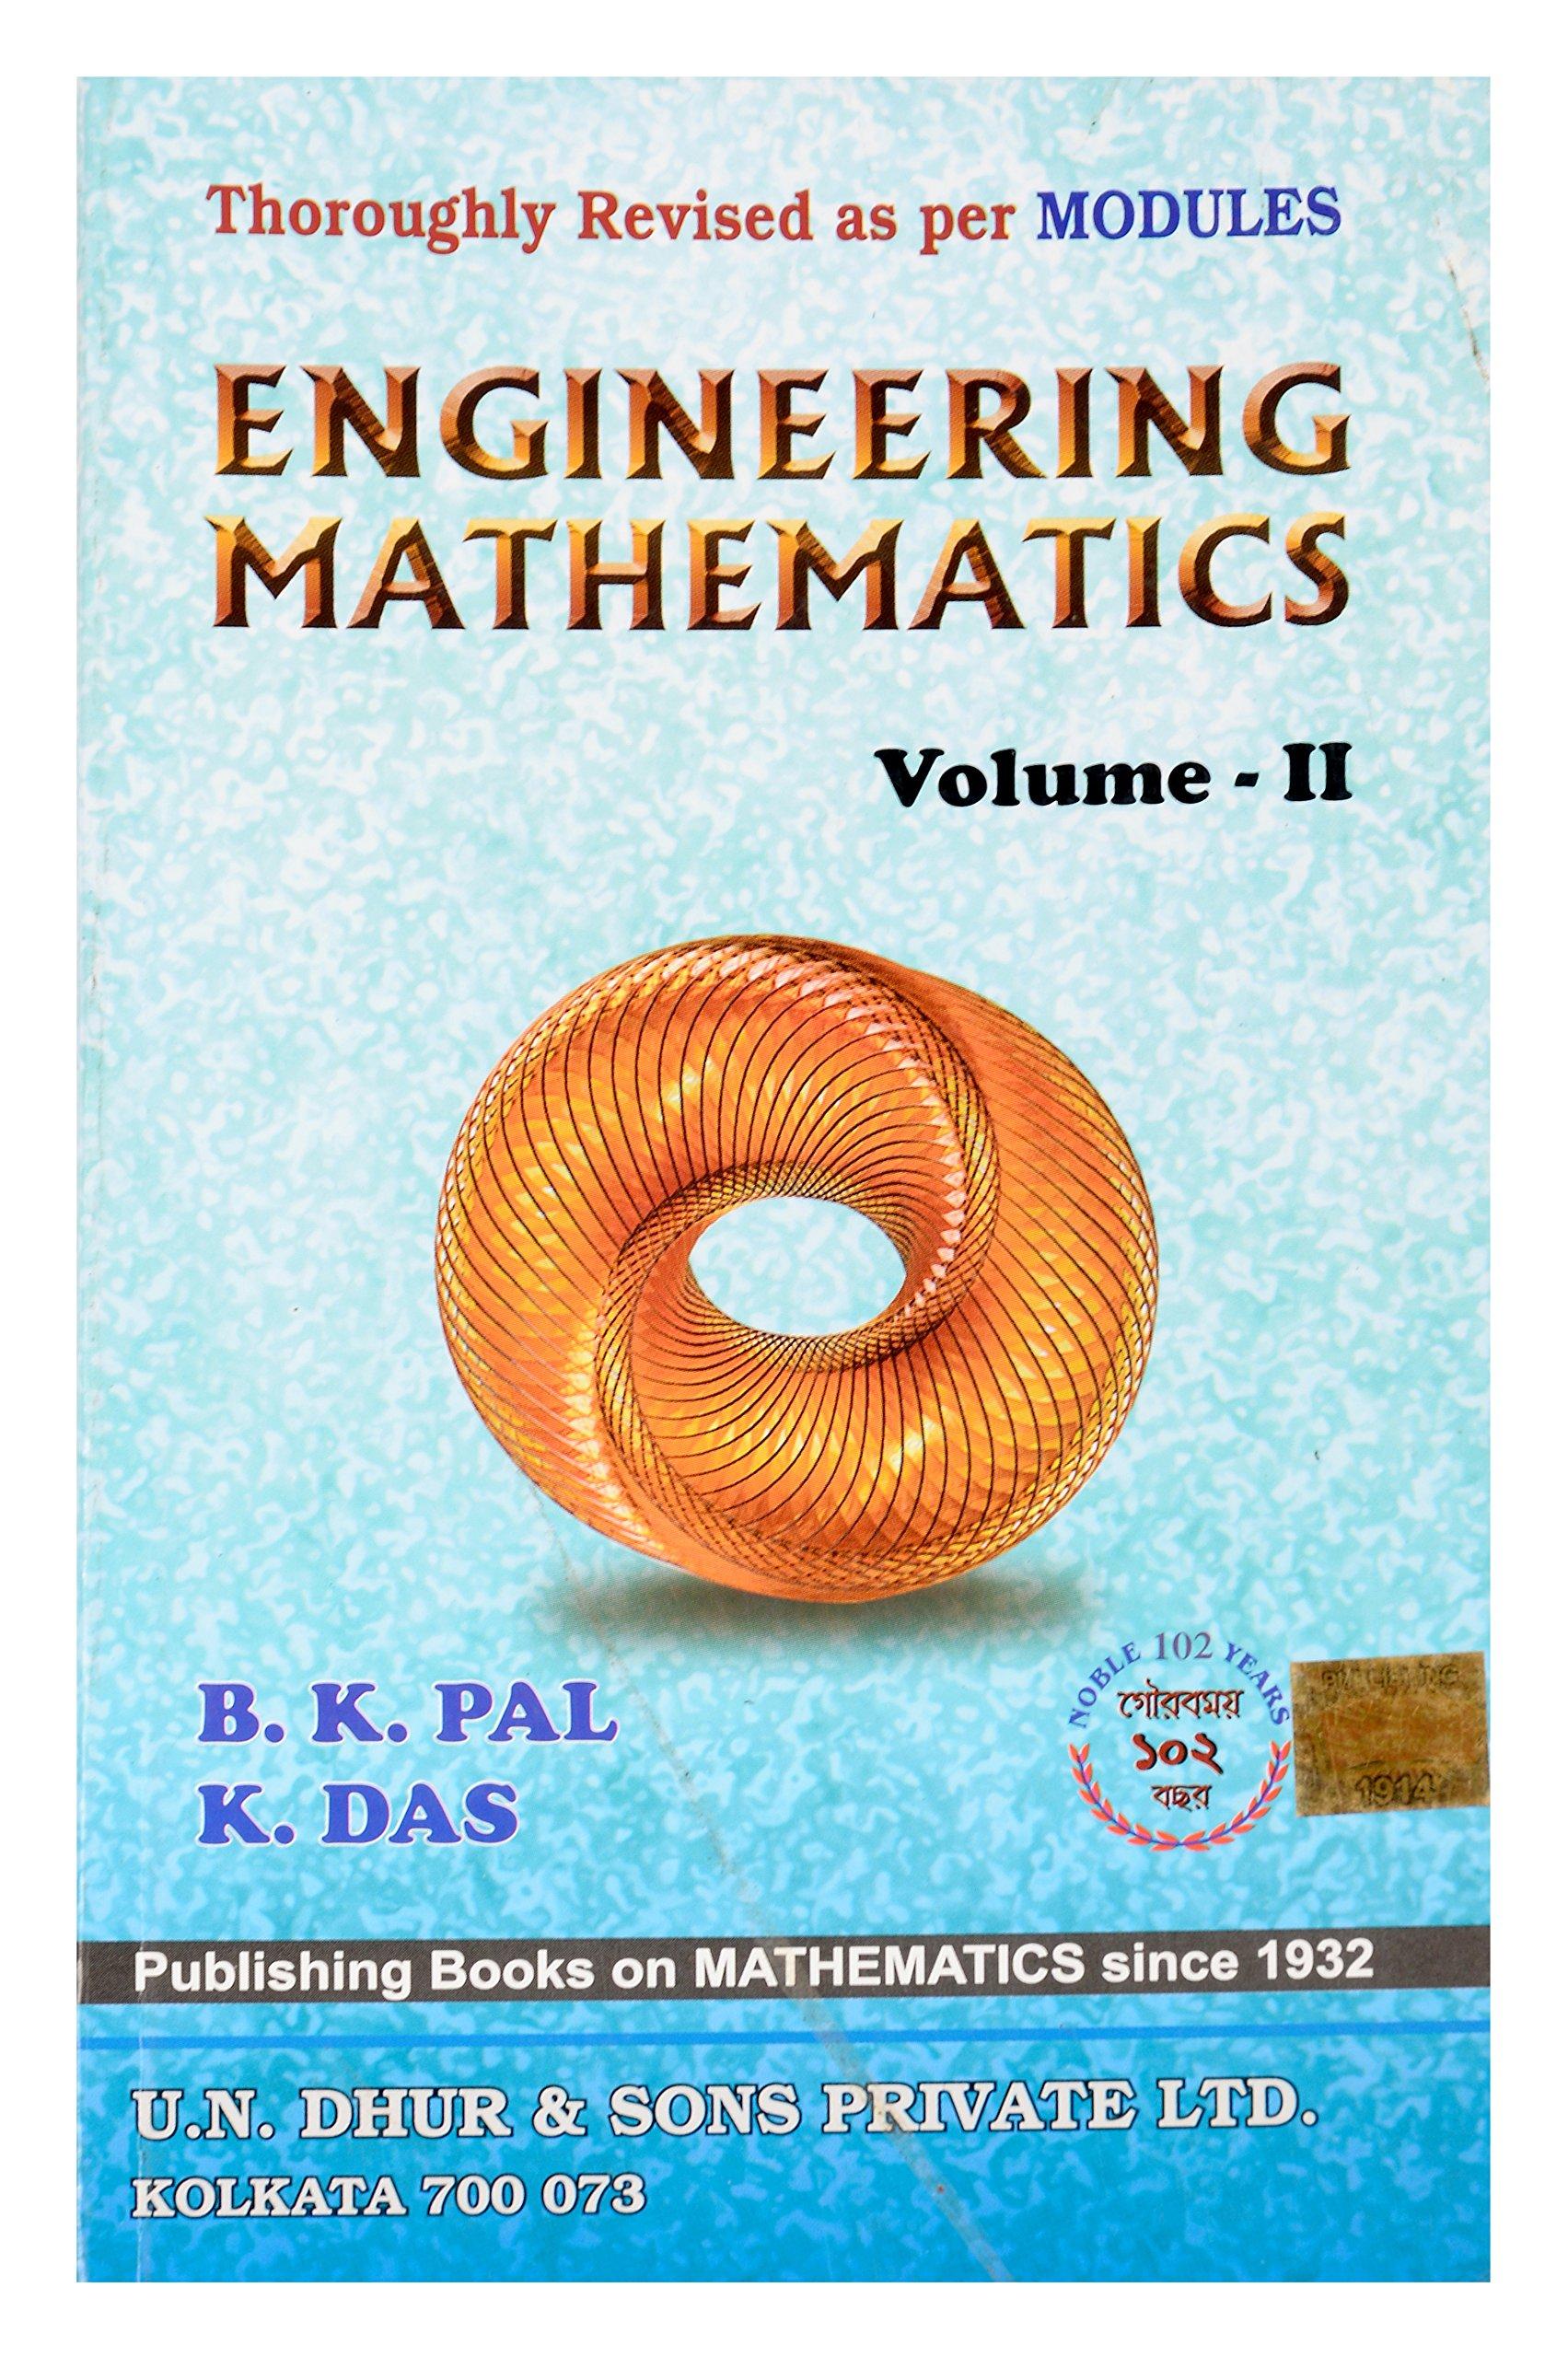 pdf of engineering mathematics volume 2 of pal das download